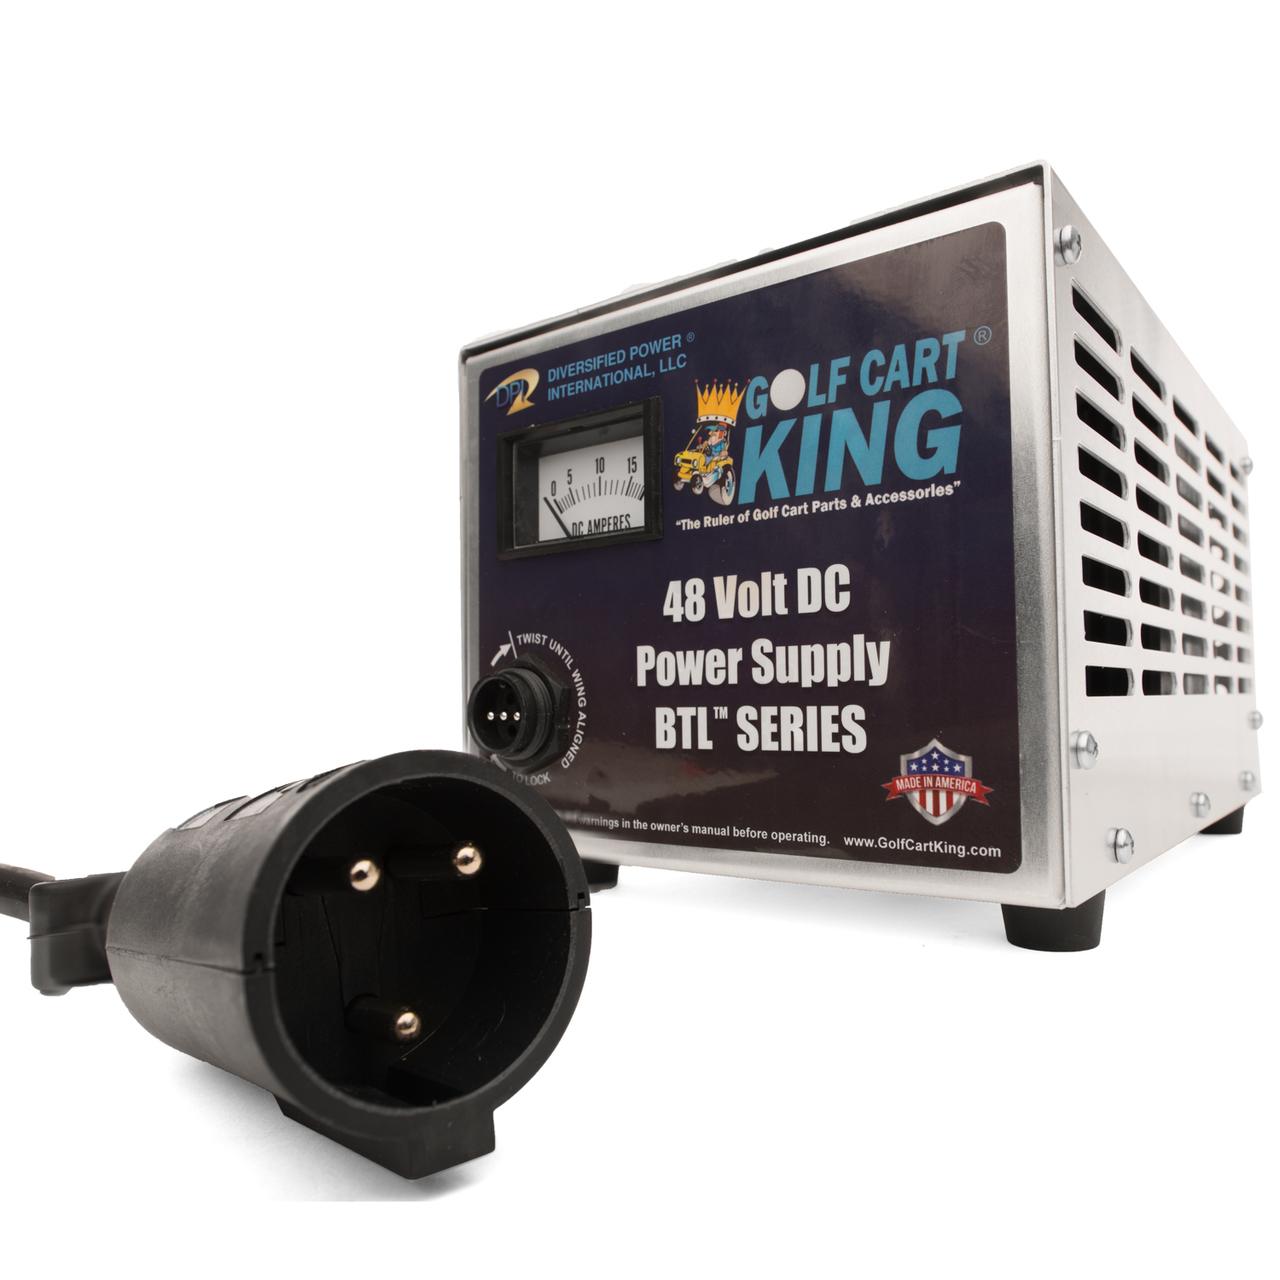 Club Car Charger | Precedent & DS | 48 Volt 15 Amp Powerdrive IQ 3-Pin | DPI  Golf Cart Charger | Dpi 48v Charger Wiring Diagram |  | DIY Golf Cart